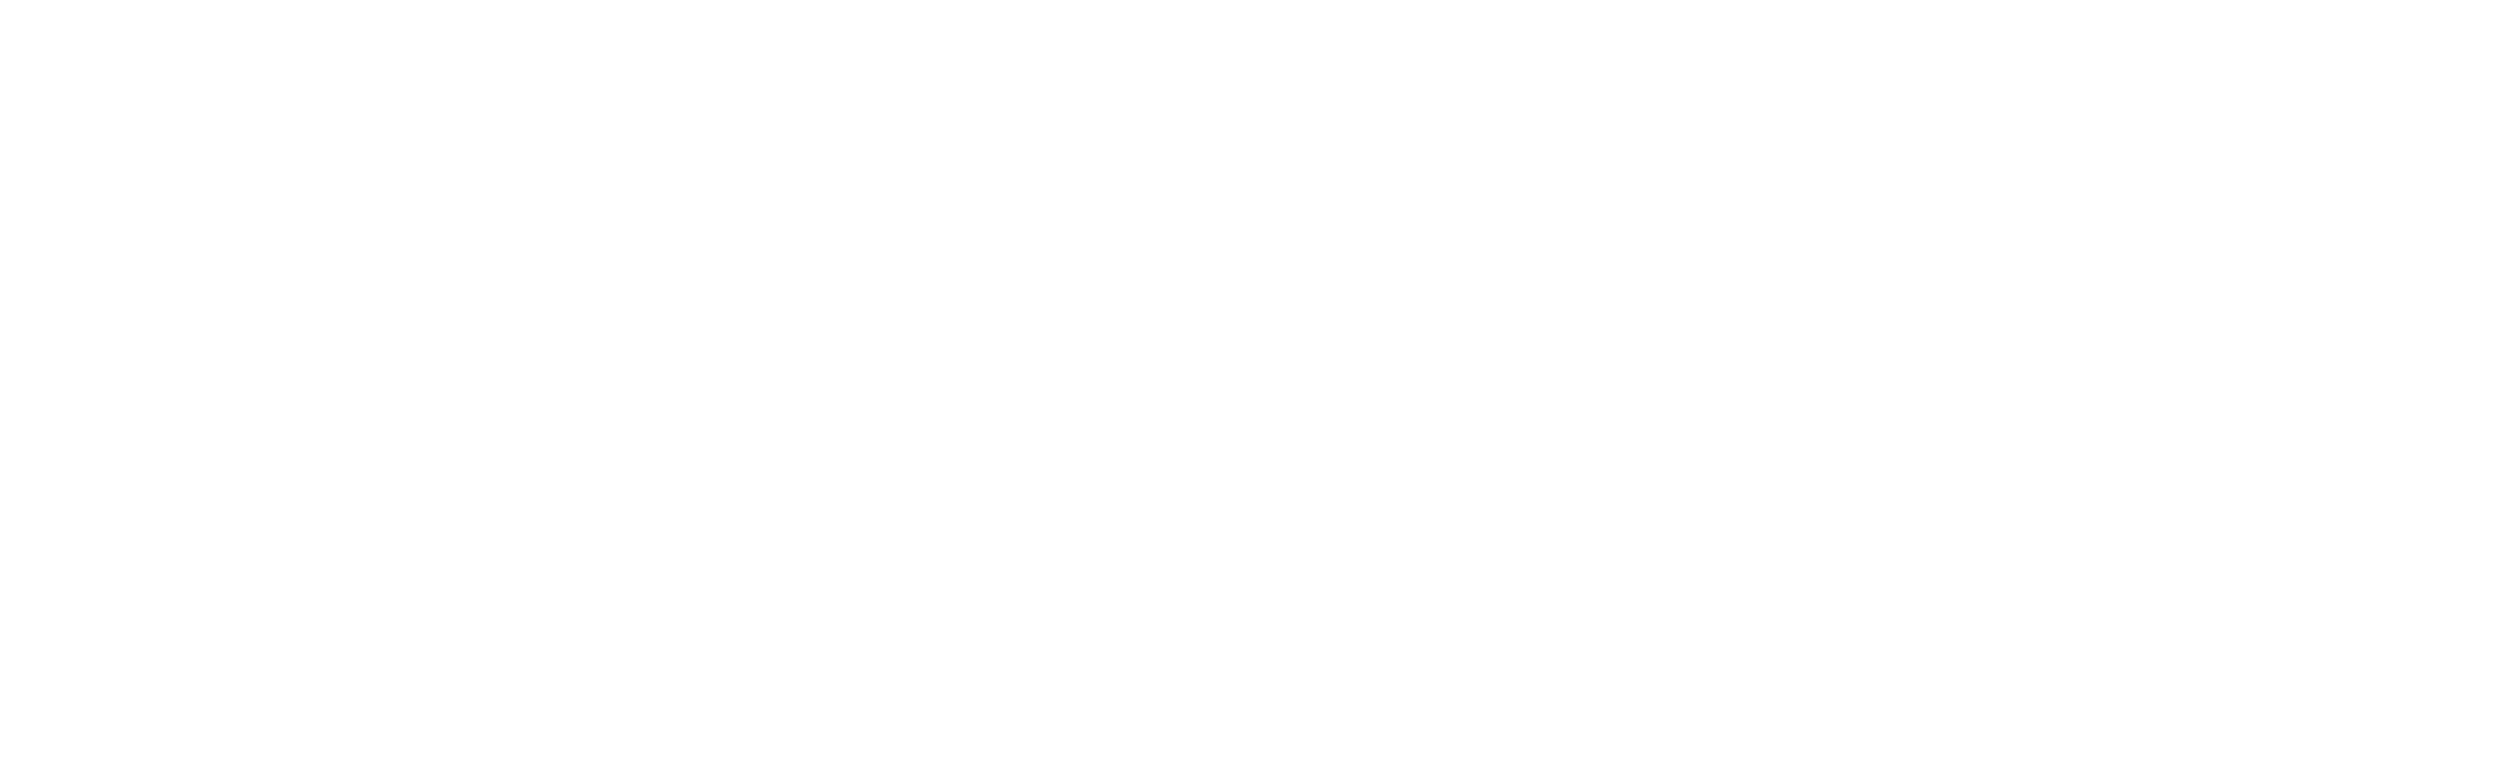 L'Allumette, -logo-white copy.png